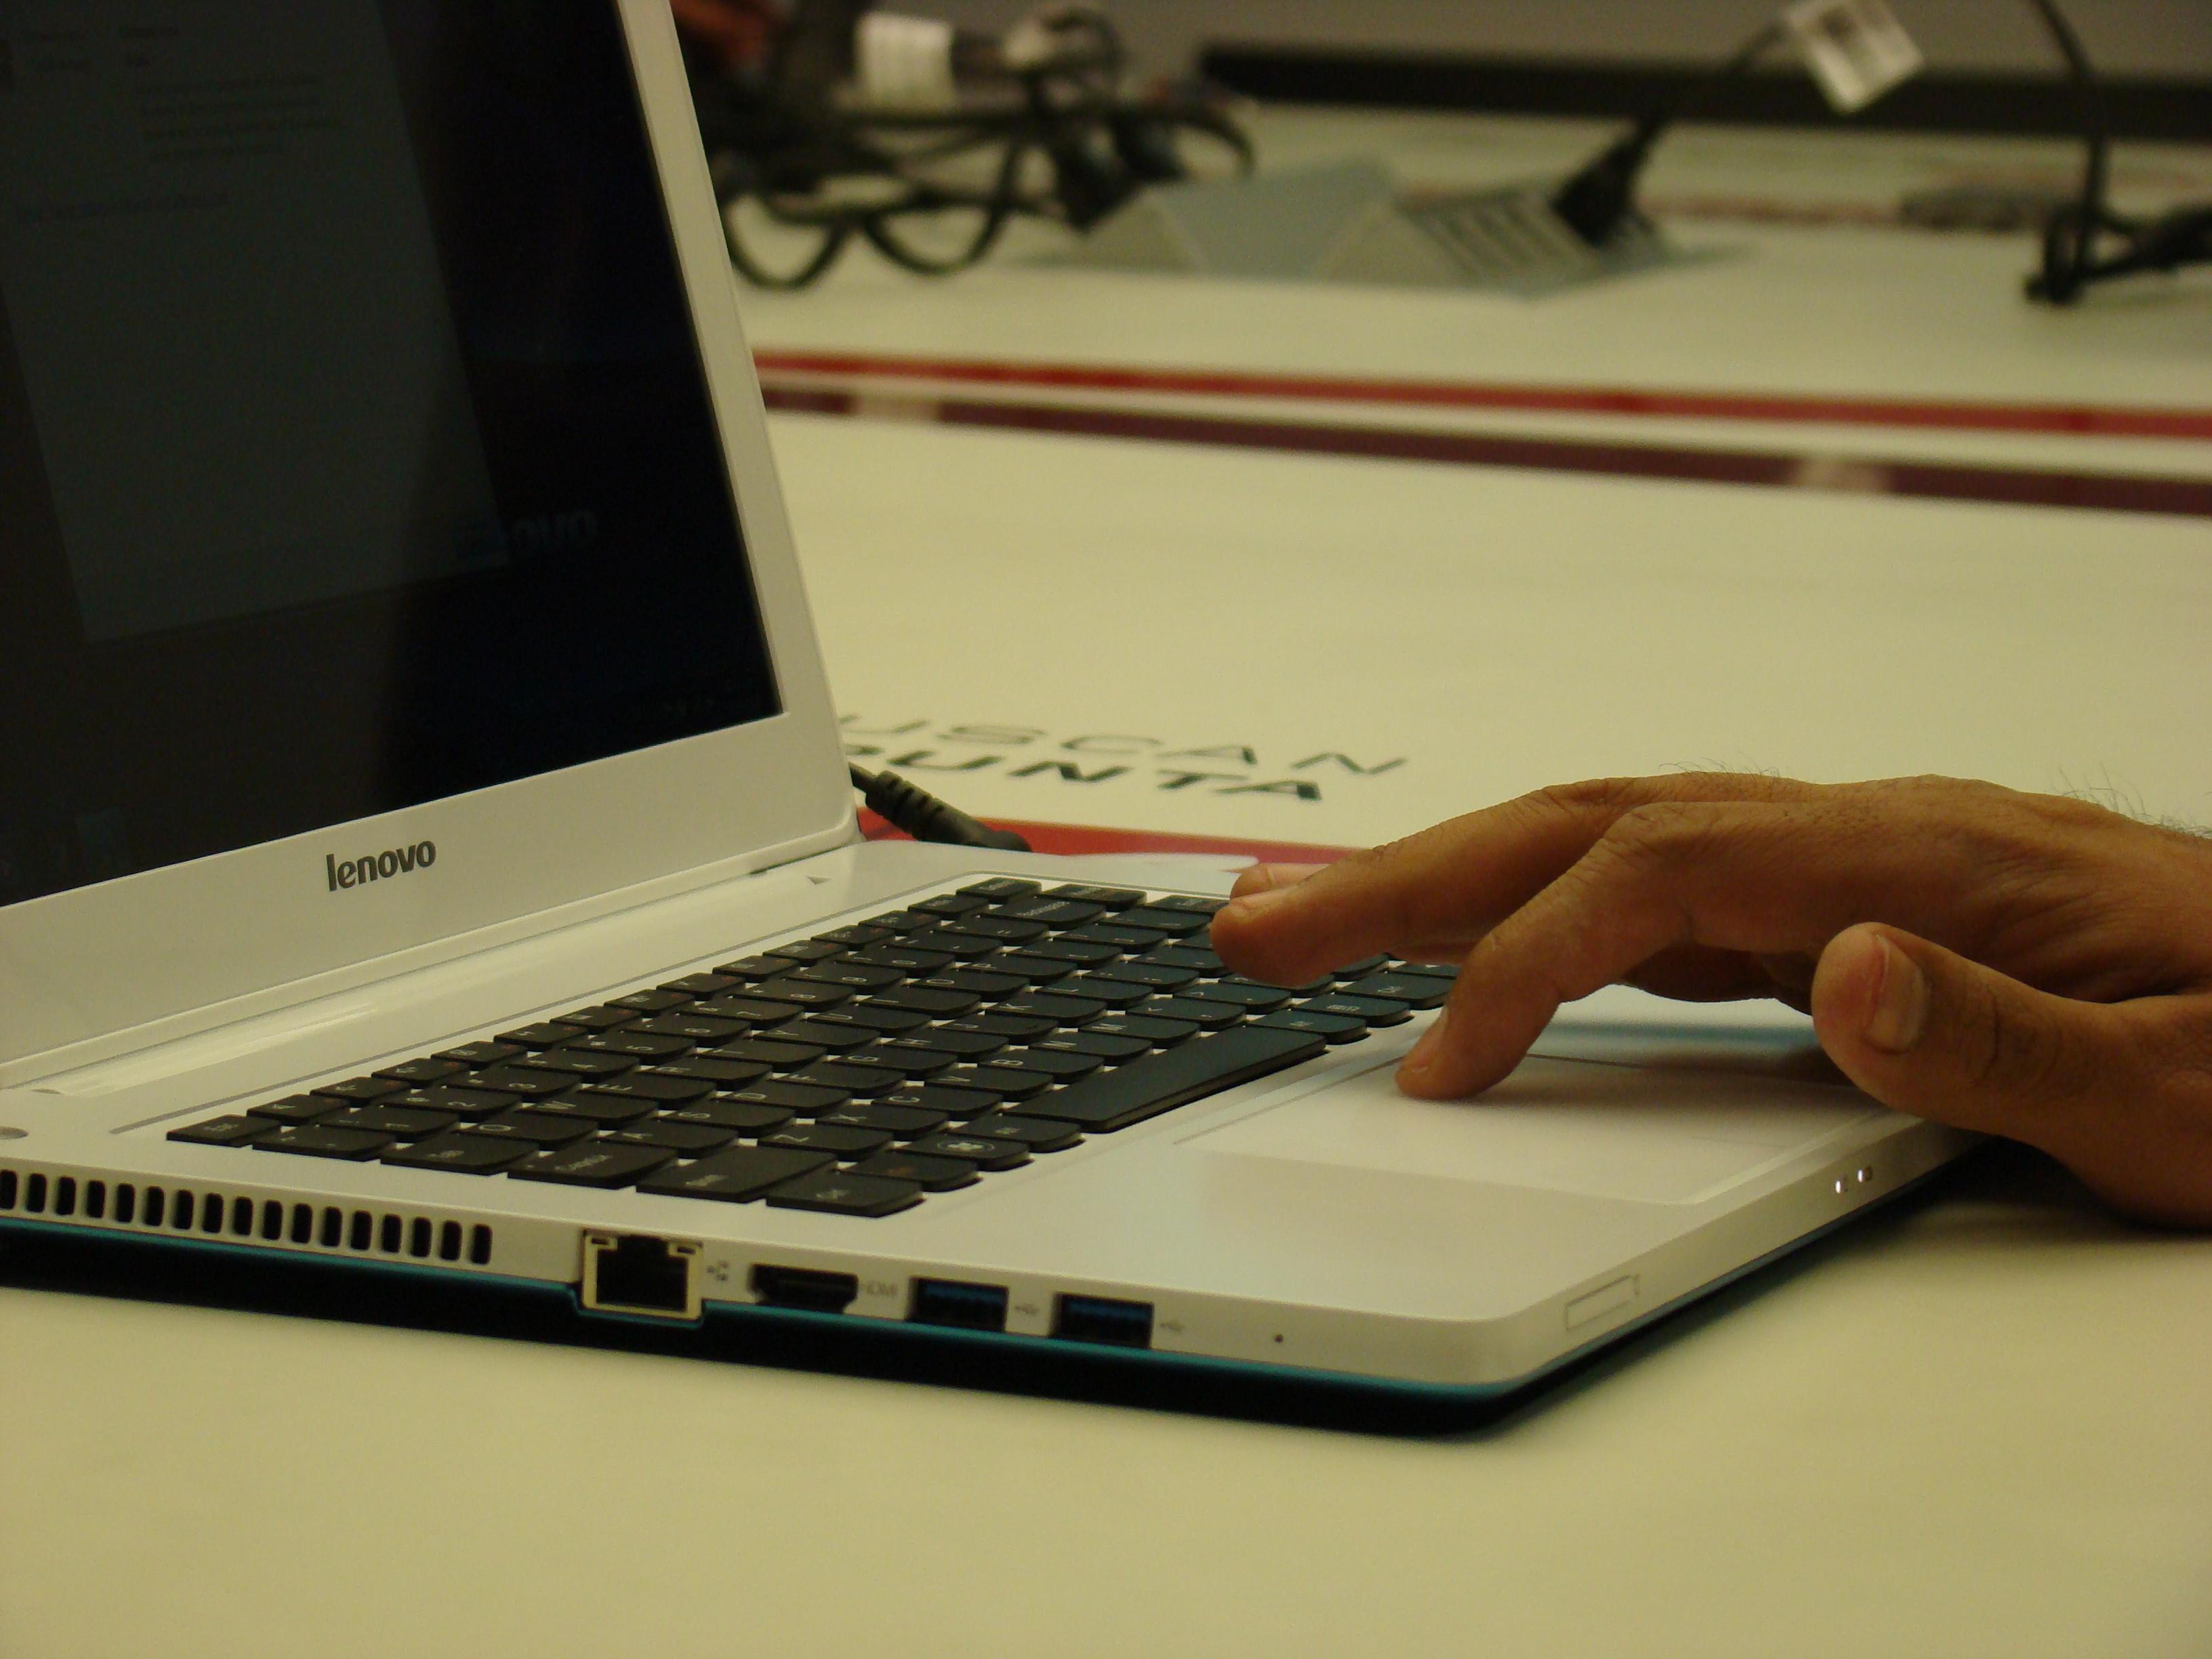 Lenovo Ultrabook 6